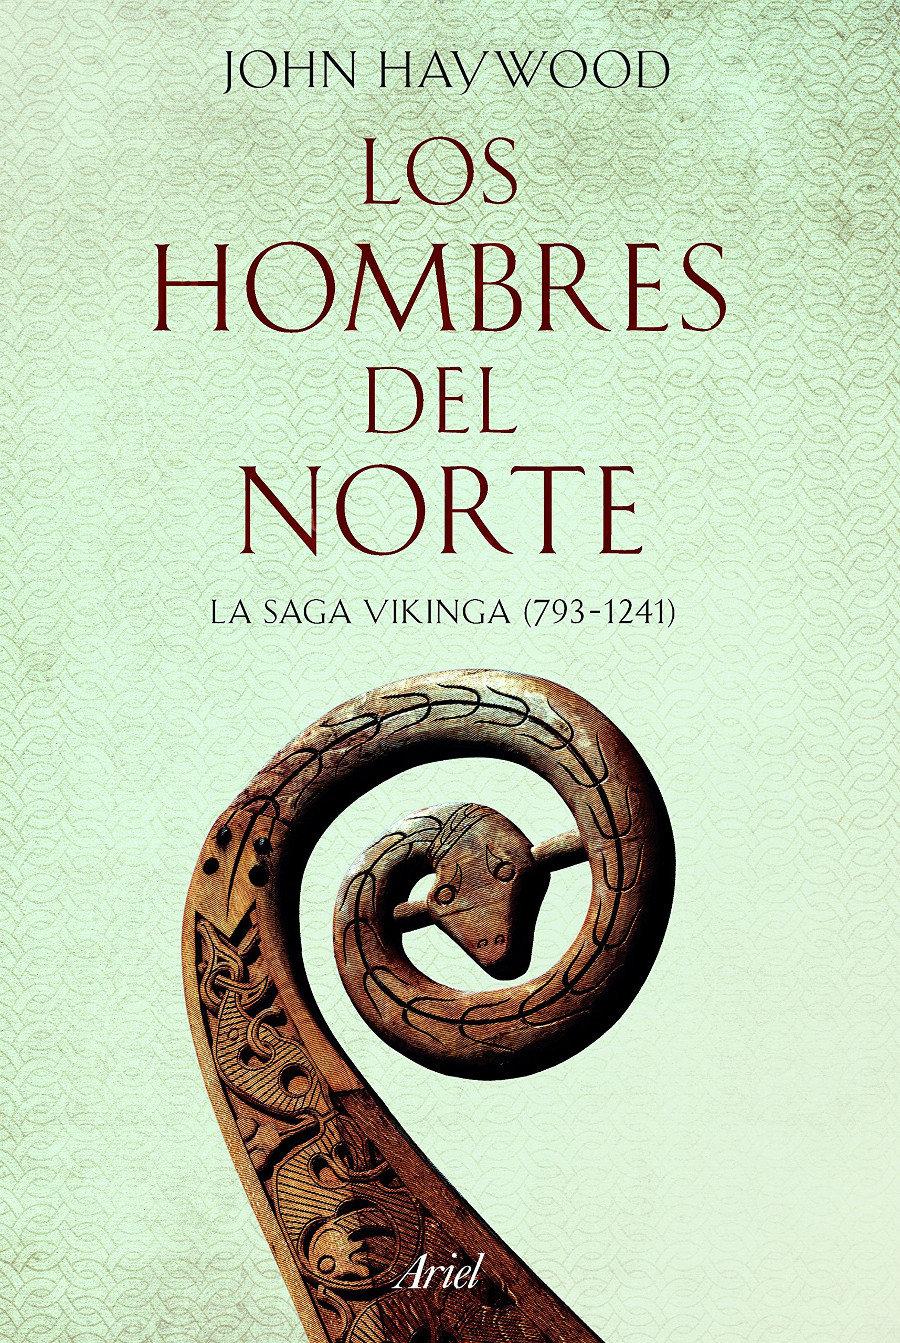 Los hombres del norte. La saga vikinga (793-1241) Book Cover